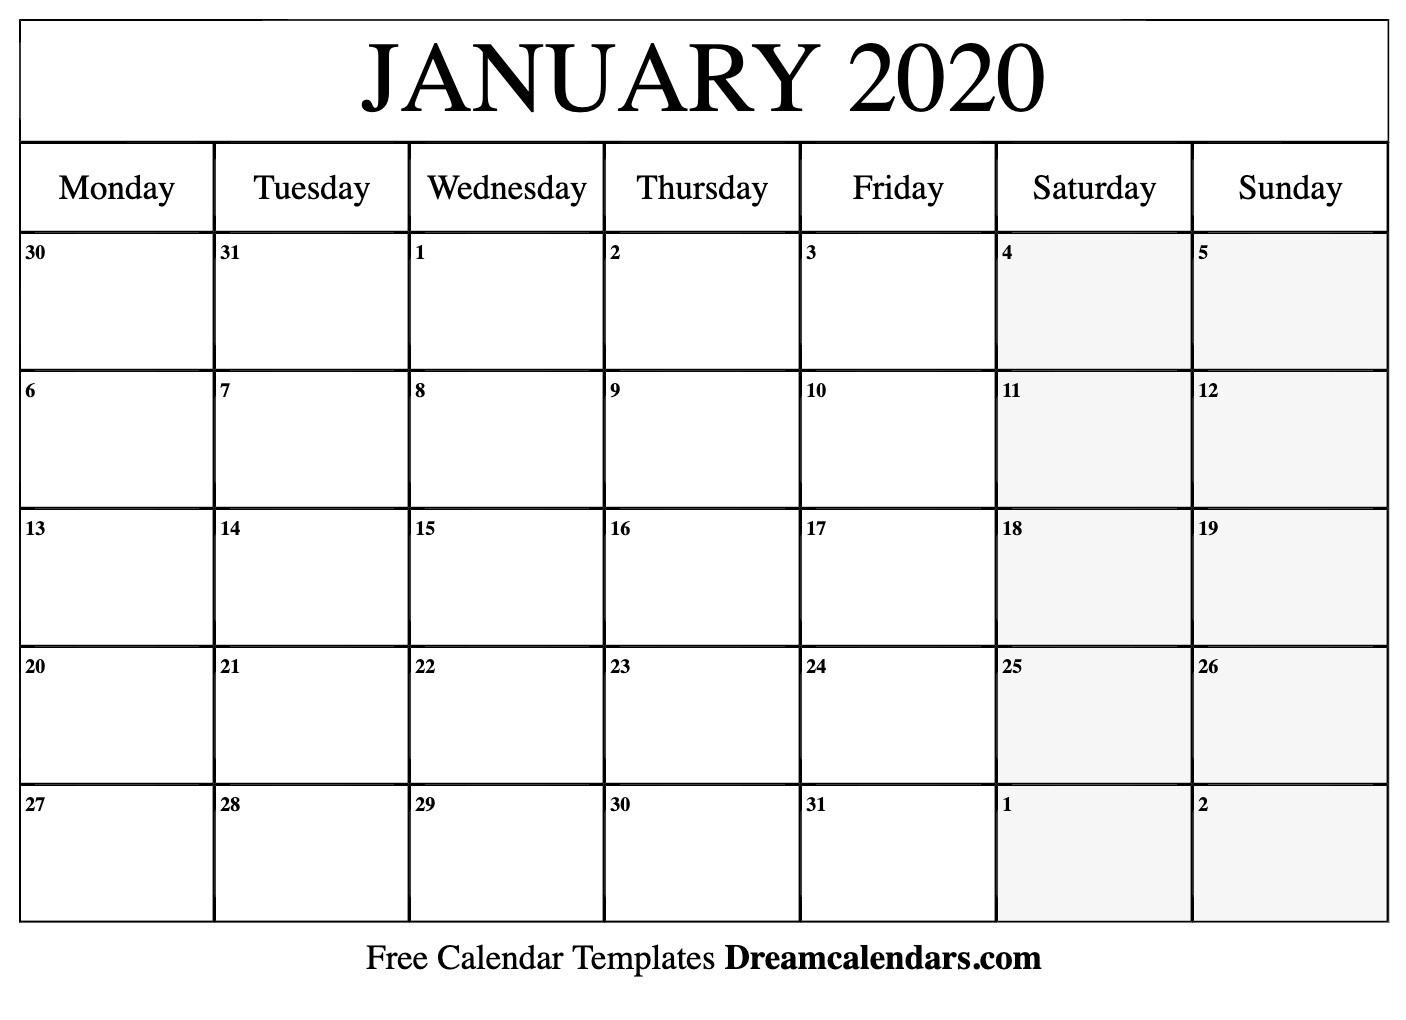 Printable January 2020 Calendar-Printable Monthly Calendar January 2020